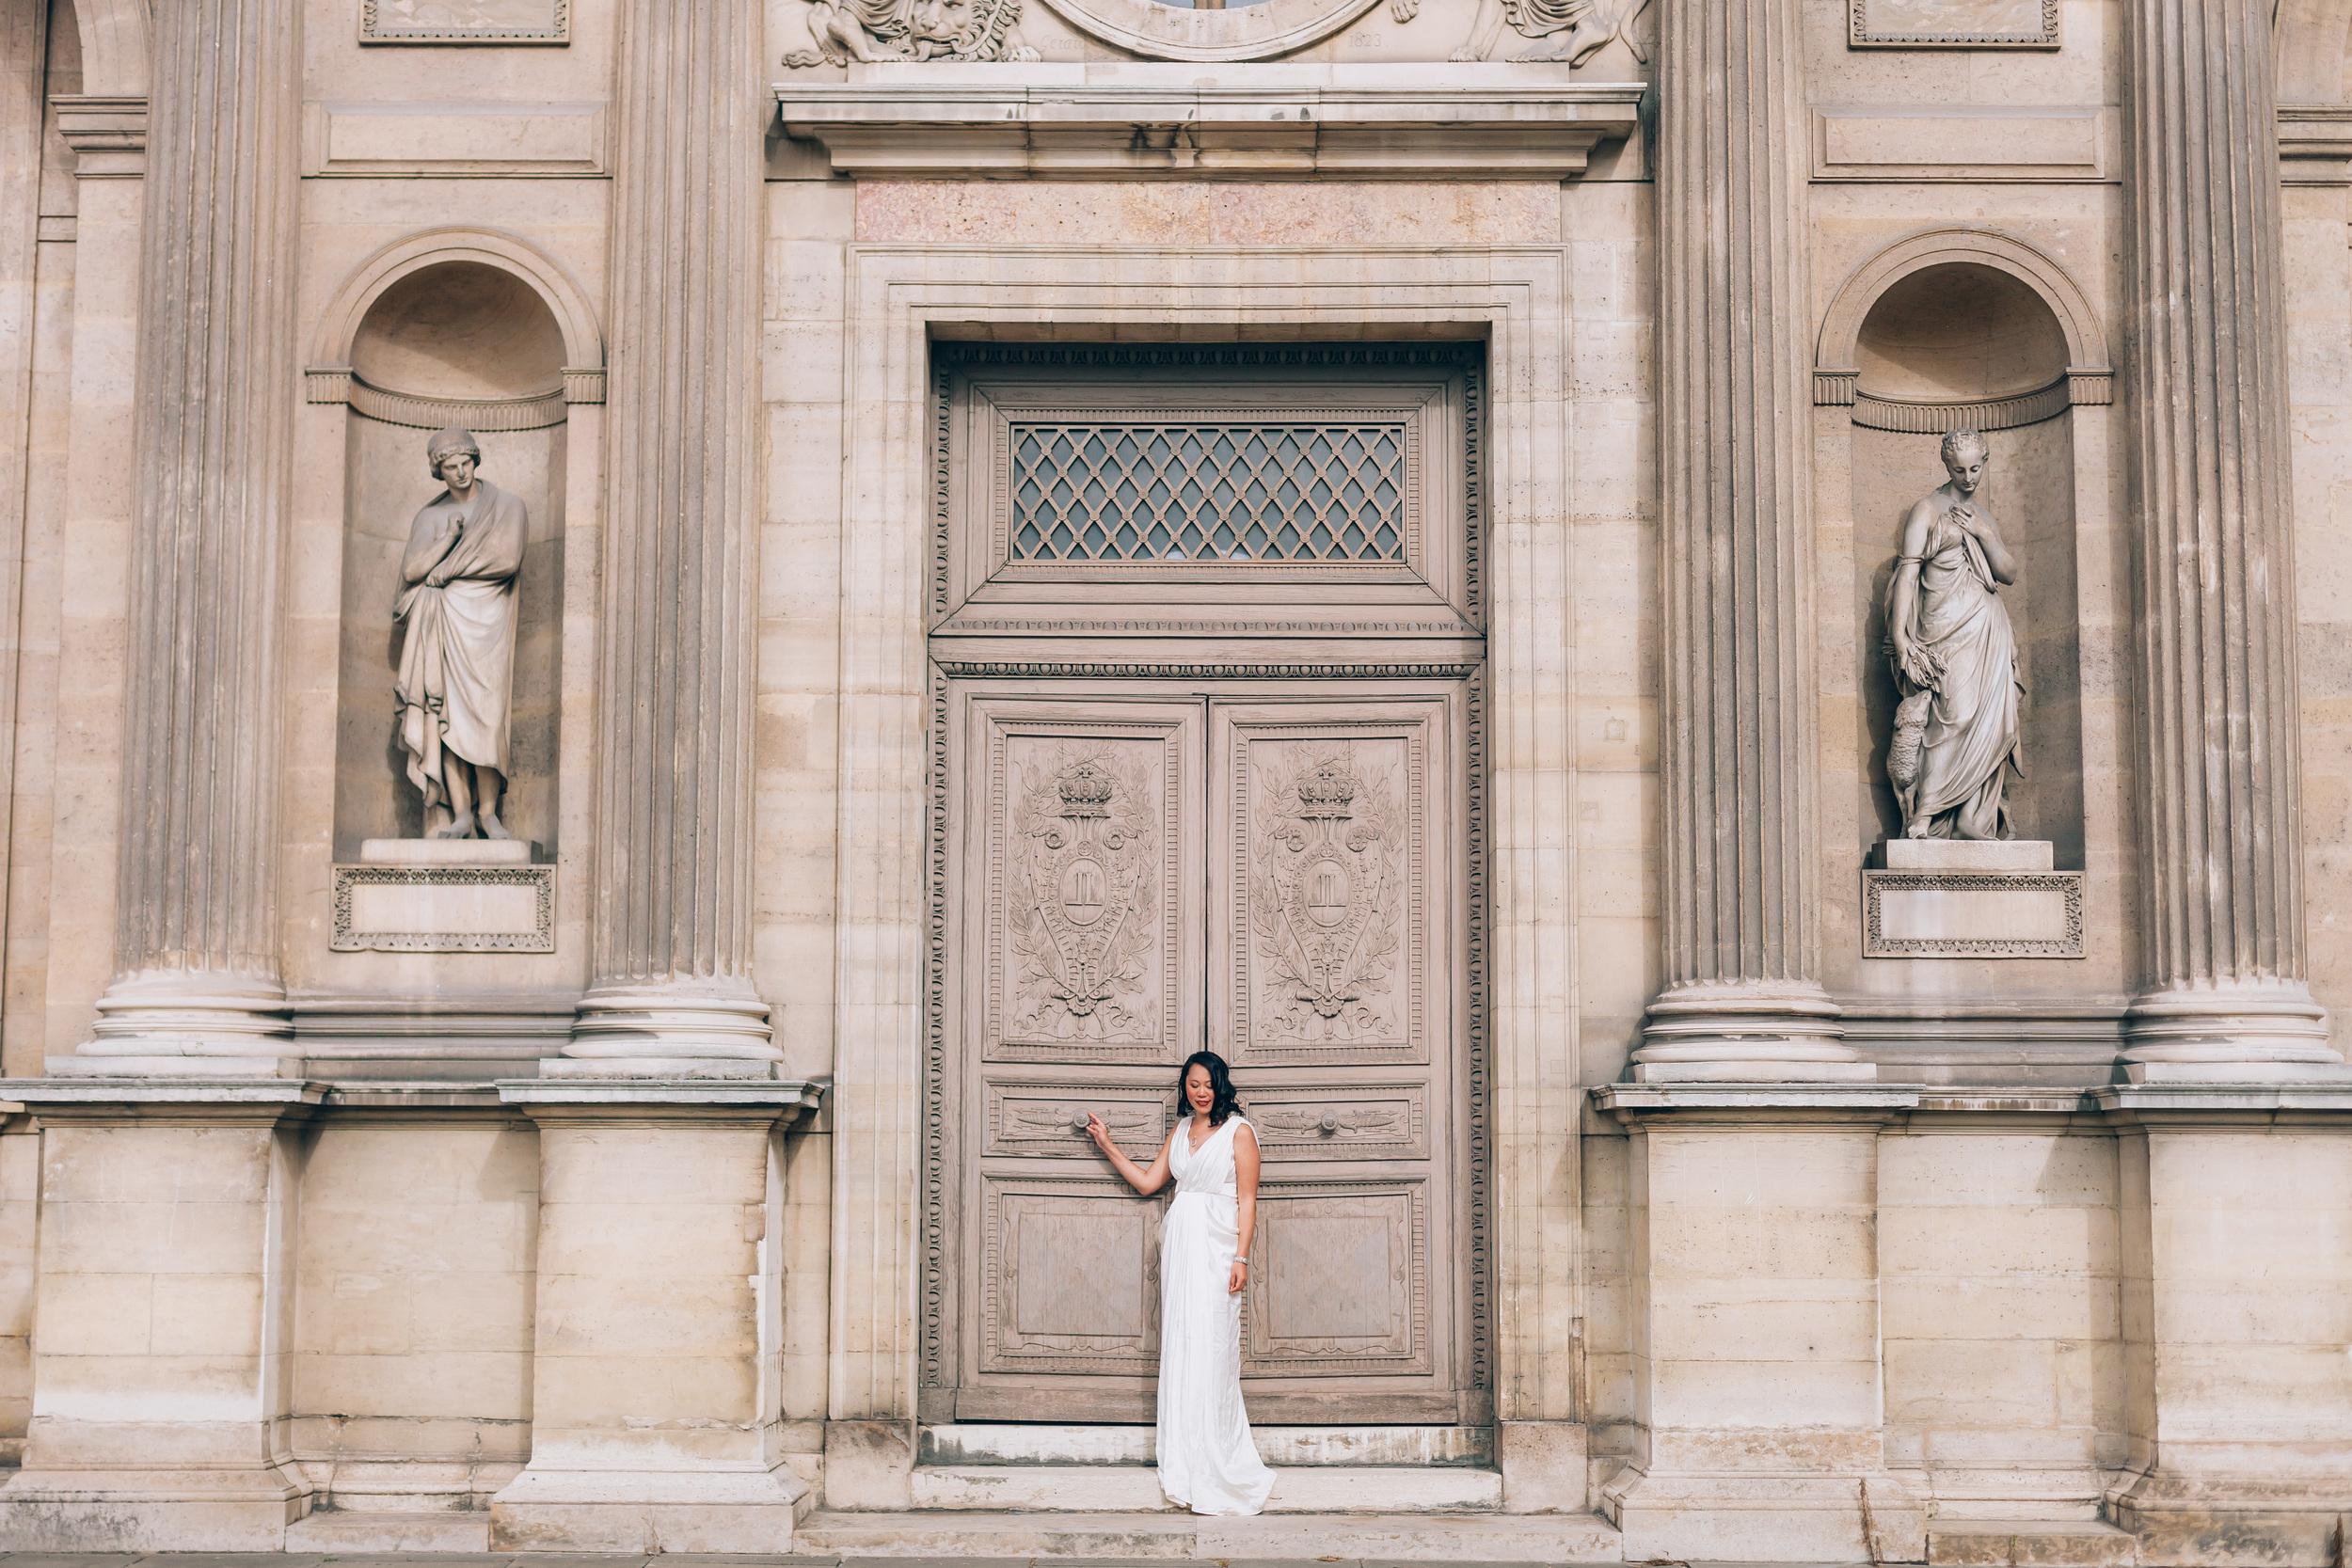 Photographer in Paris, The Louvre, Birthday, individual, portrait session, IheartParisfr